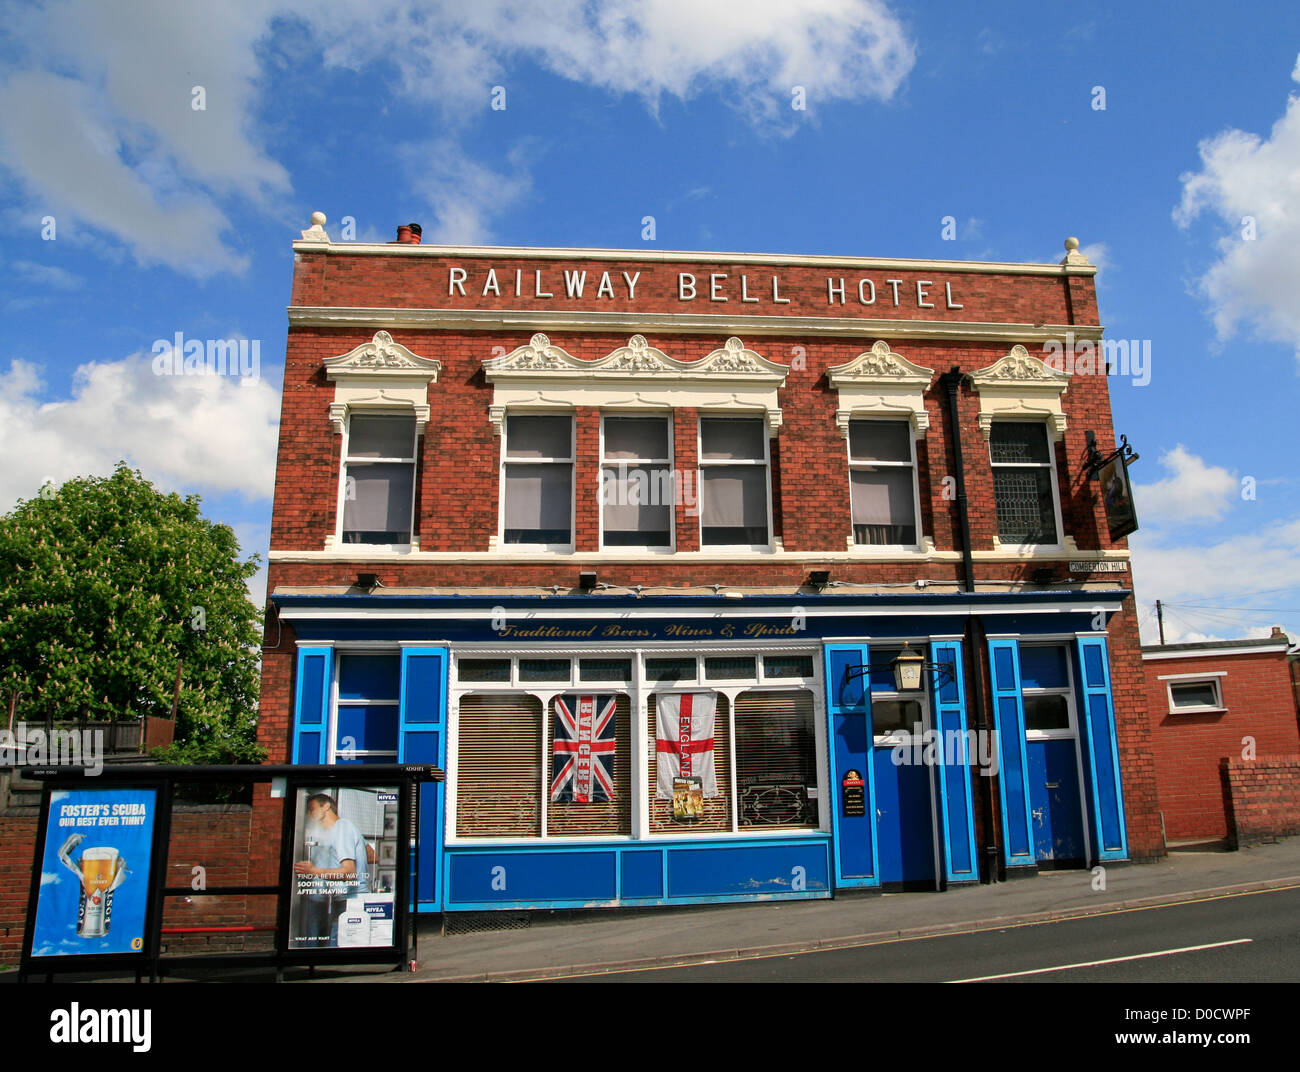 Railway Bell Inn Kidderminster Worcestershire England UK - Stock Image